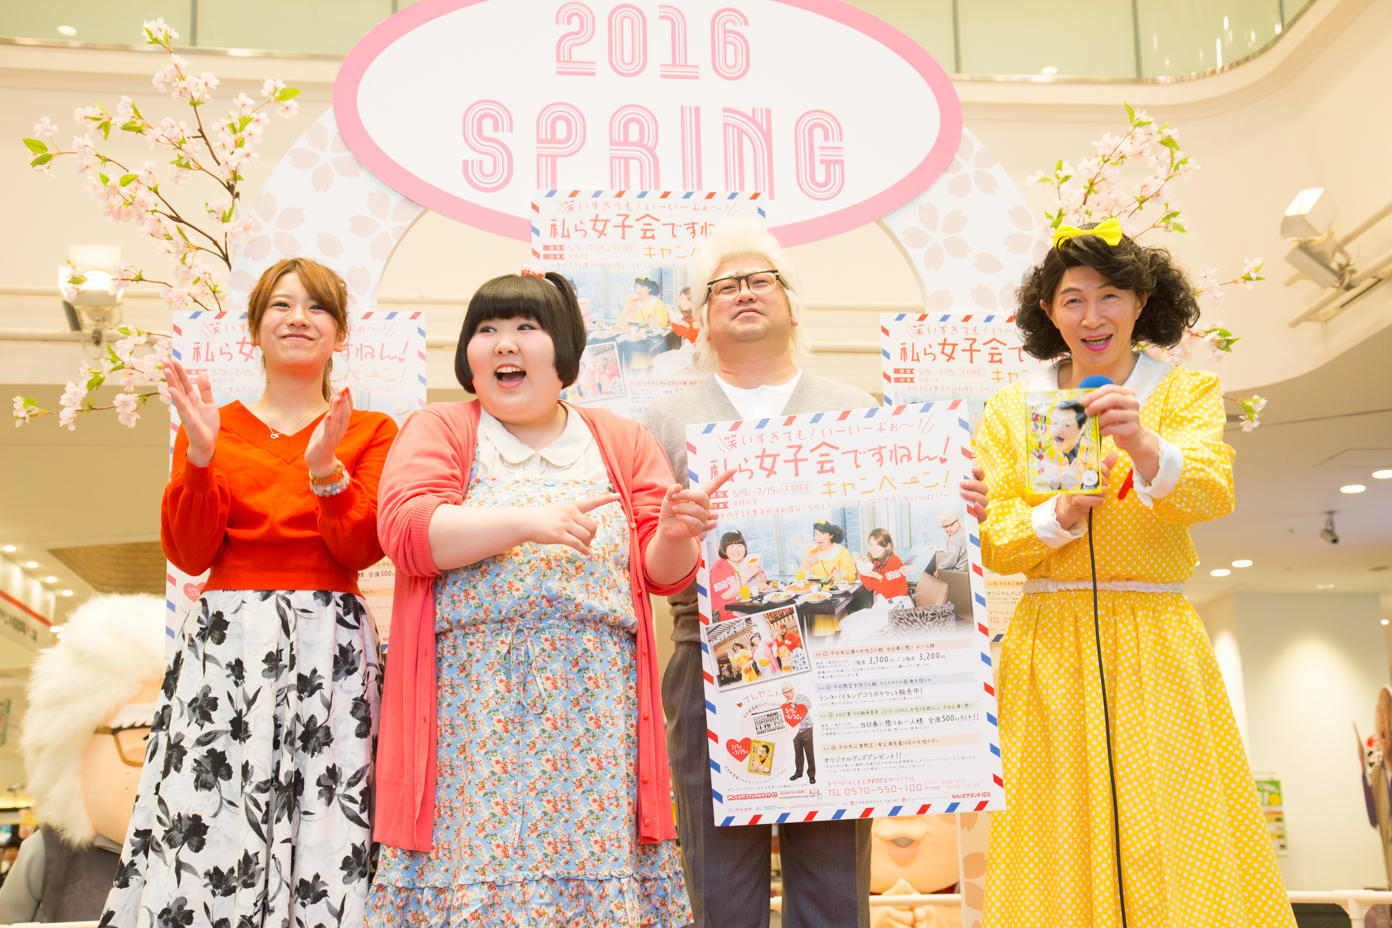 http://news.yoshimoto.co.jp/20160430154419-726ea5f7ea2359d210cdfd811b5d7532456cde03.jpg